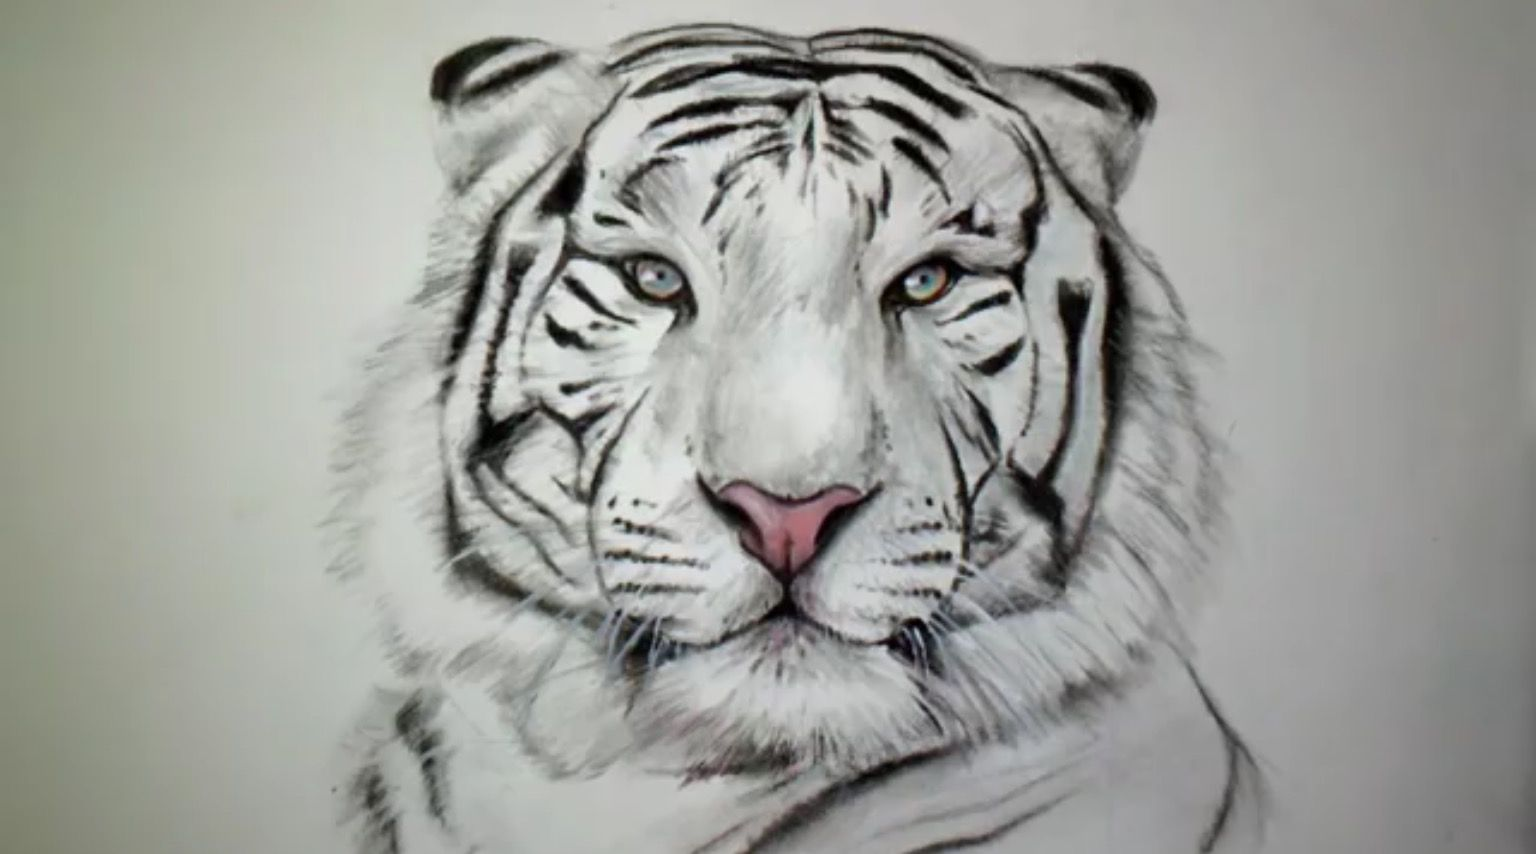 Pingl par ayla sur dessins comment dessiner un tigre dessin et dessin tigre - Comment dessiner un tigre ...